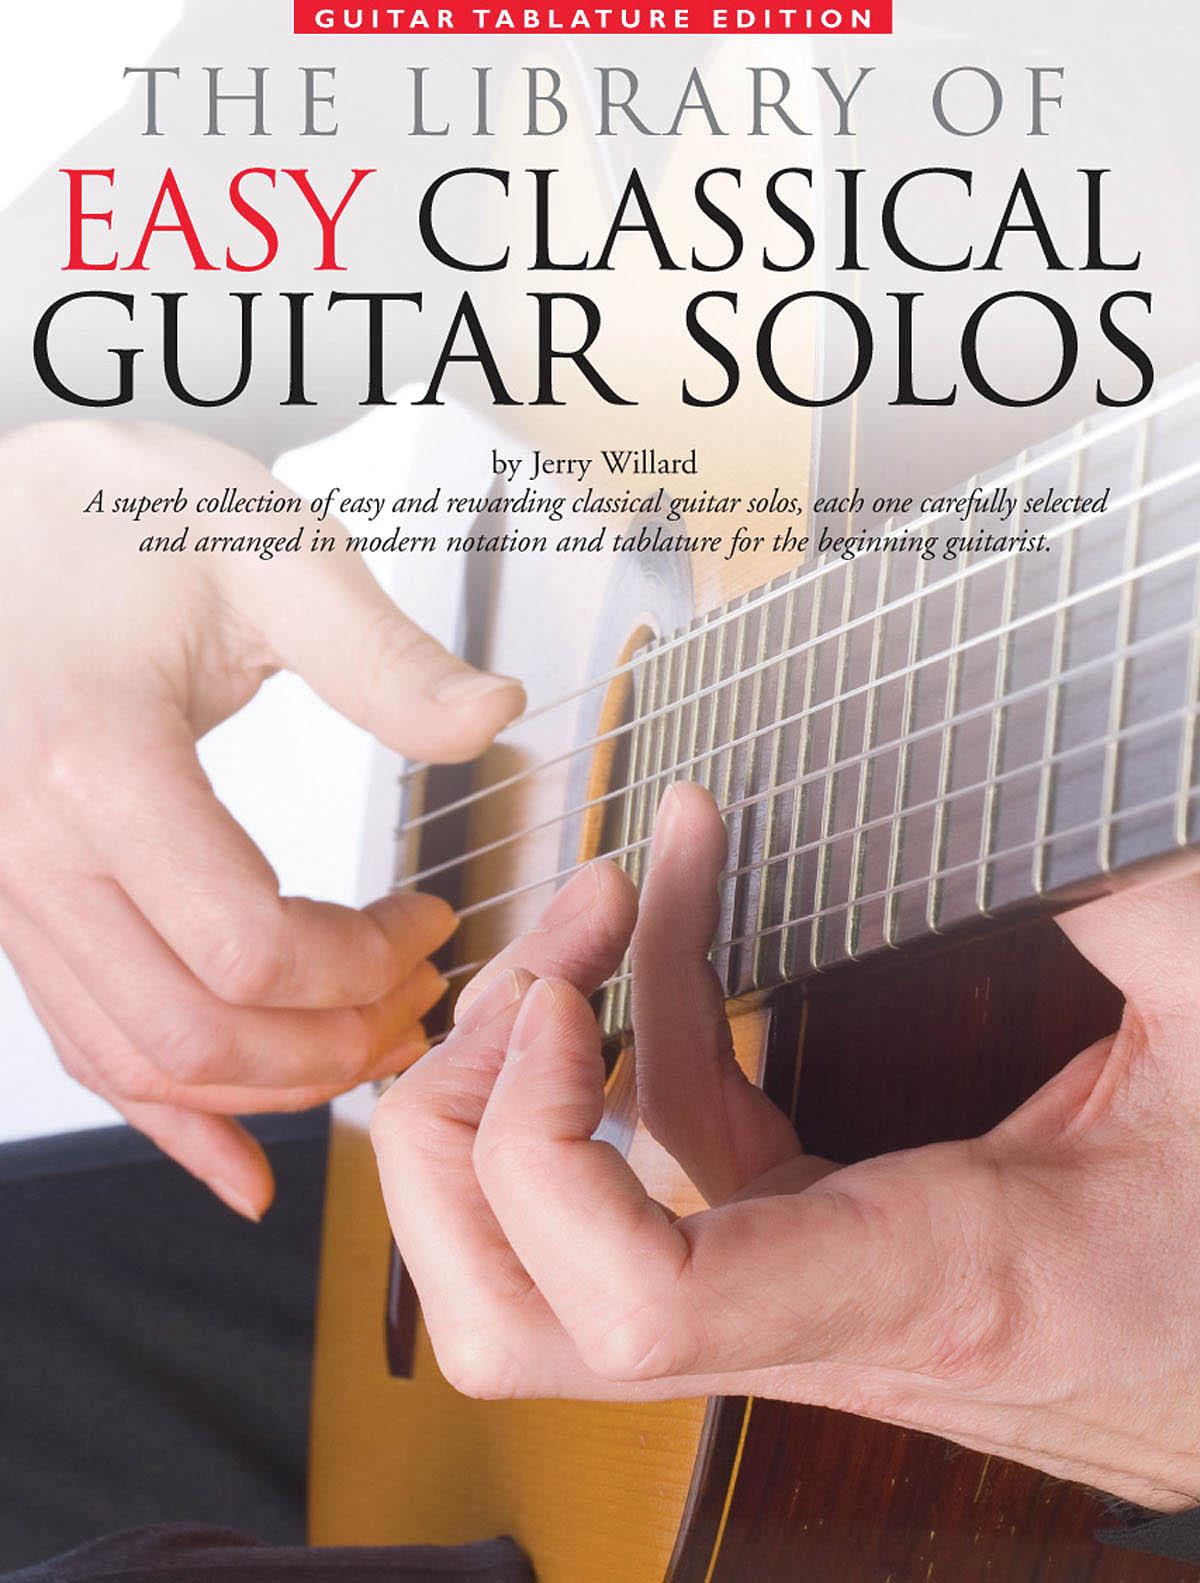 Library of Easy Classical Guitar Solos: Guitar: Instrumental Album